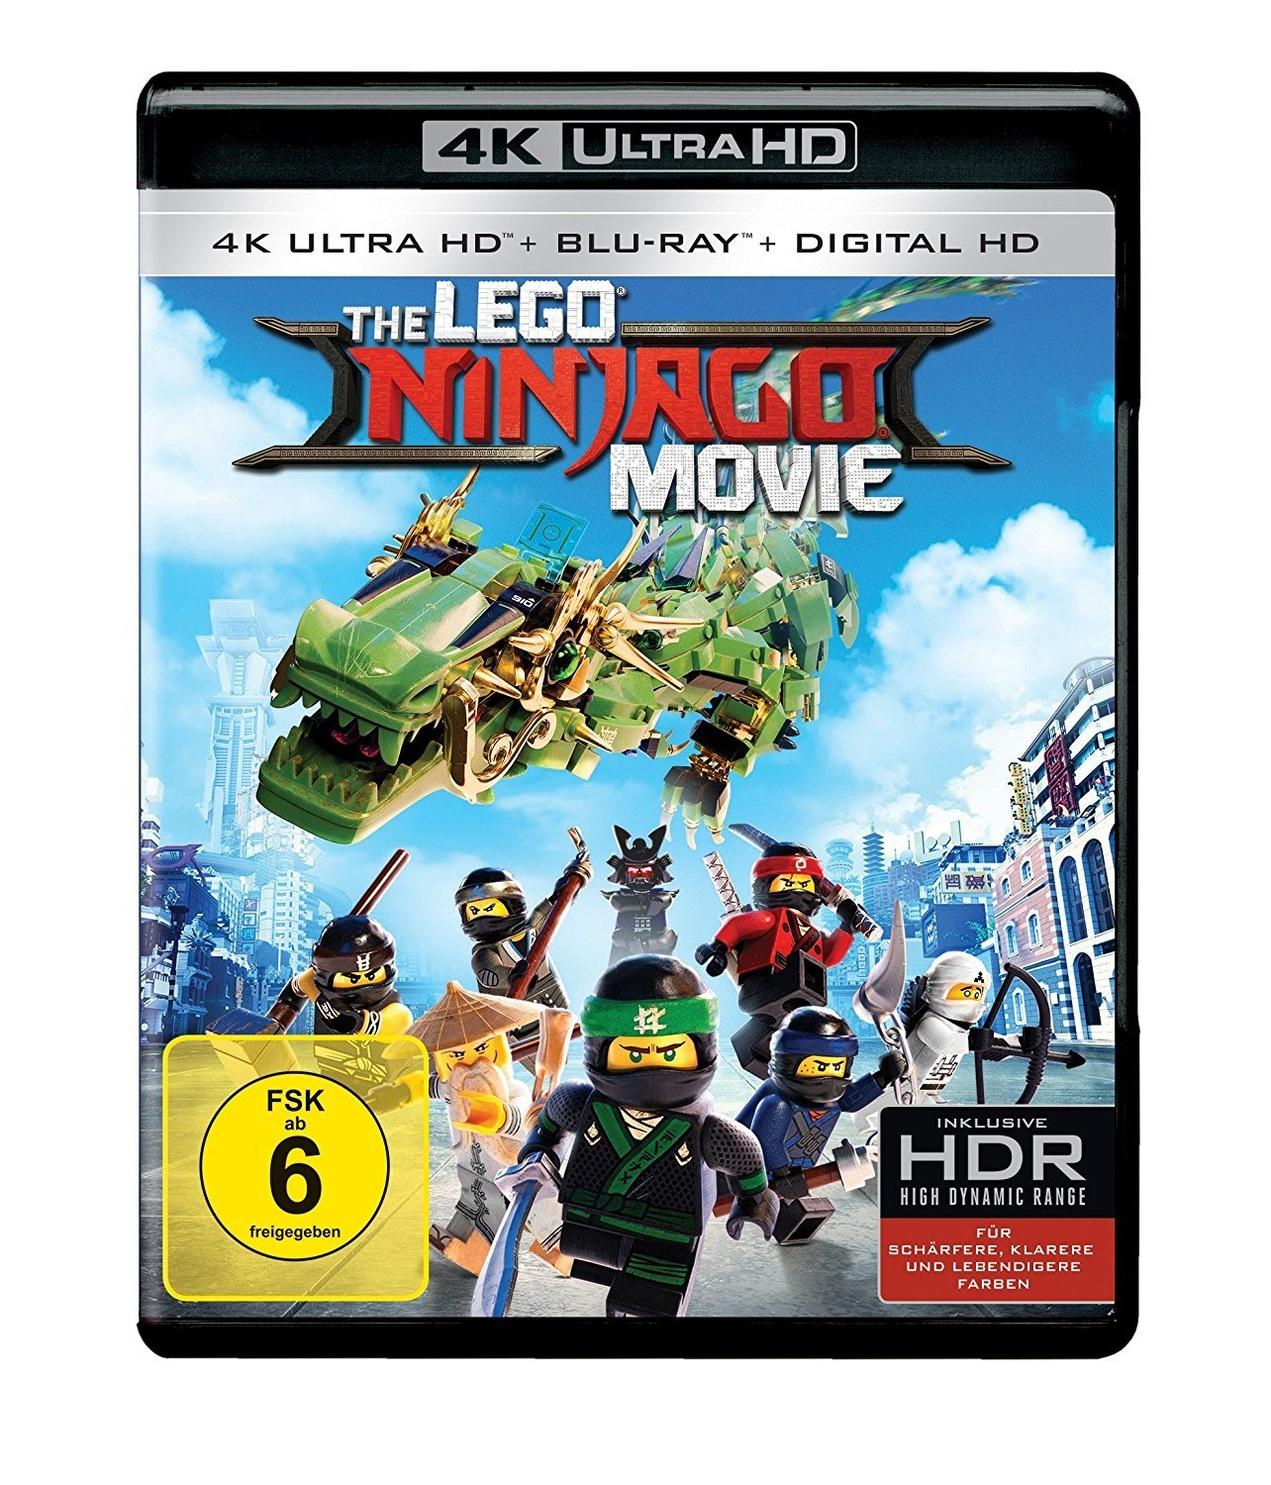 The LEGO Ninjago Movie 4K Ultra HD Blu-ray bei Weltbild.de kaufen